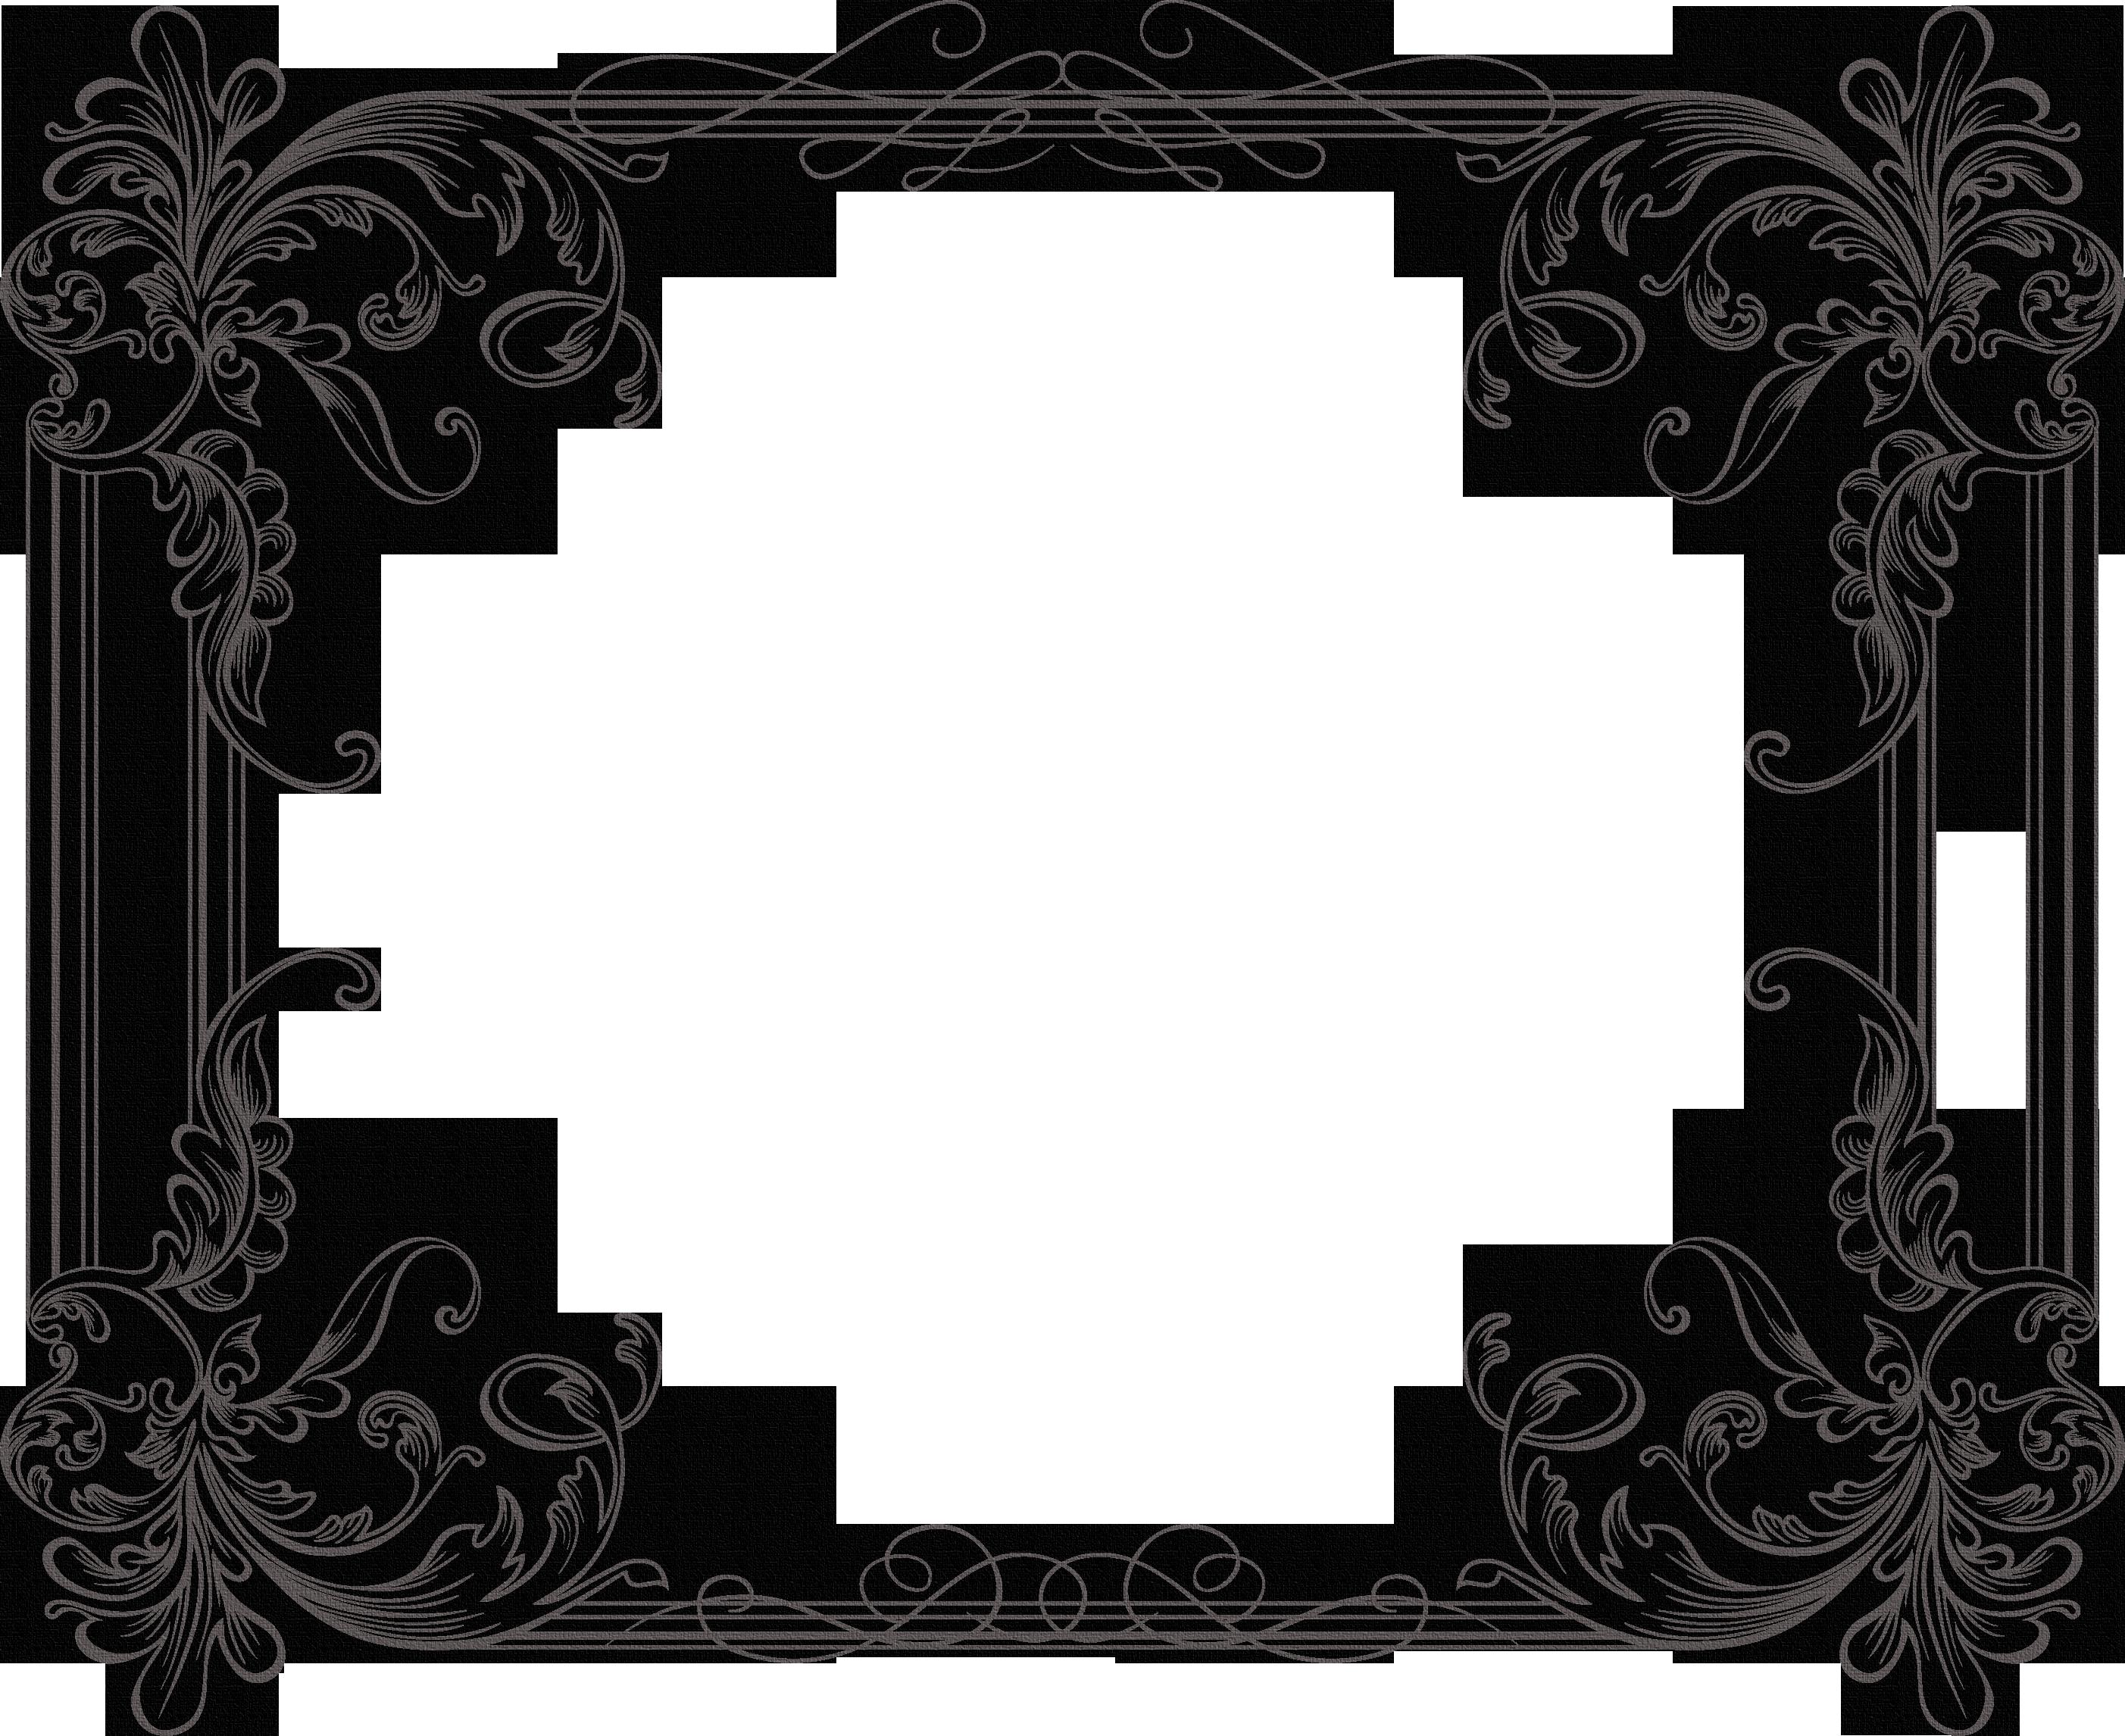 Pin von Mary Barnes-Ekobena auf Assorted Frames for Artwork ...